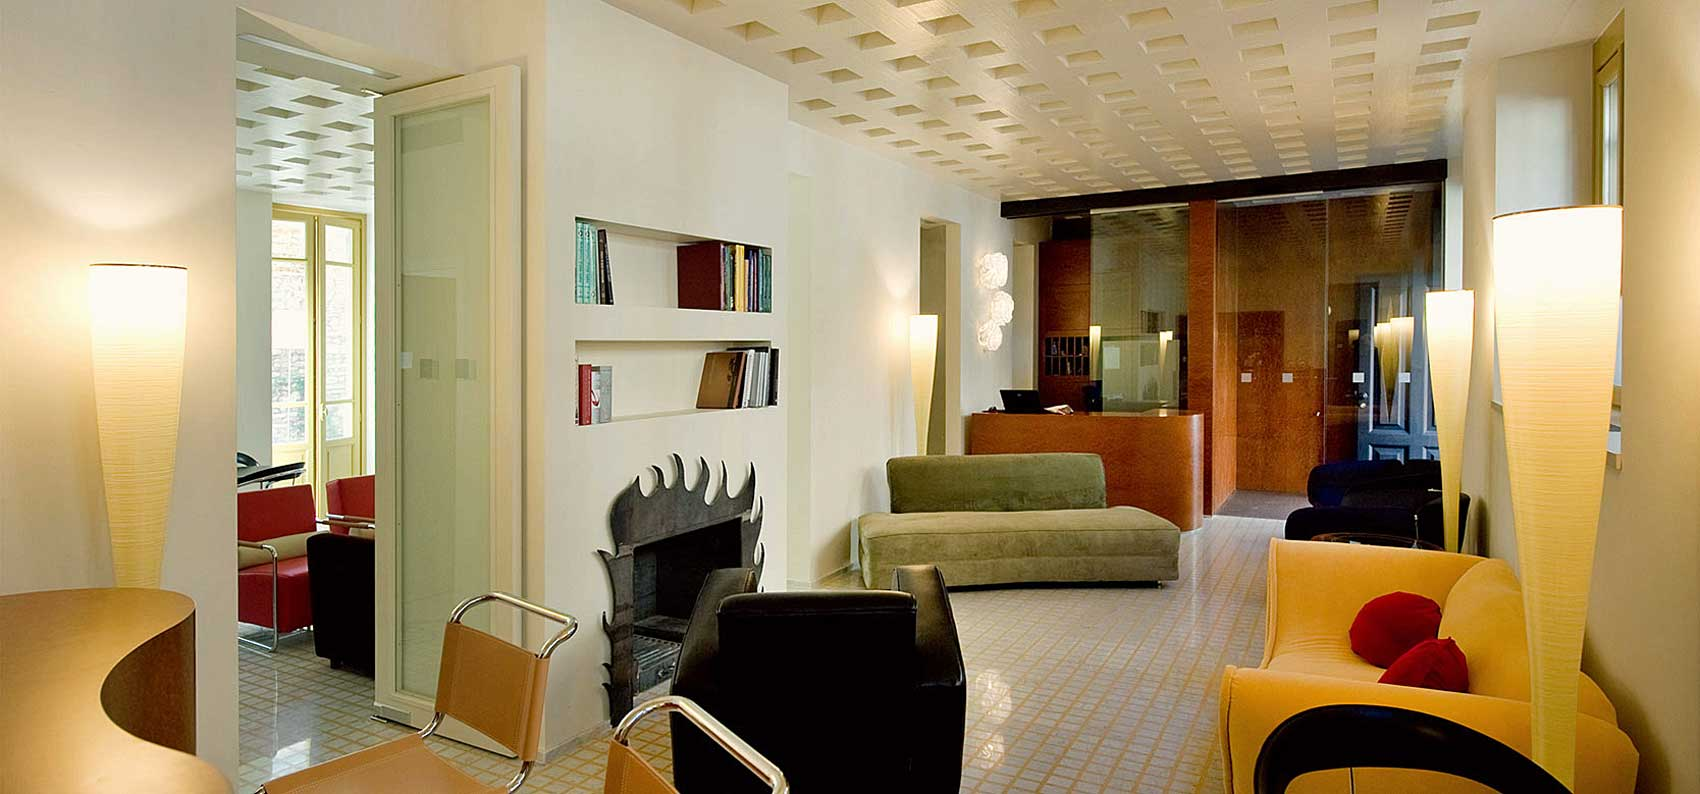 Boutique Hotel Petronilla, Bergamo Italie (hall d'accueil)